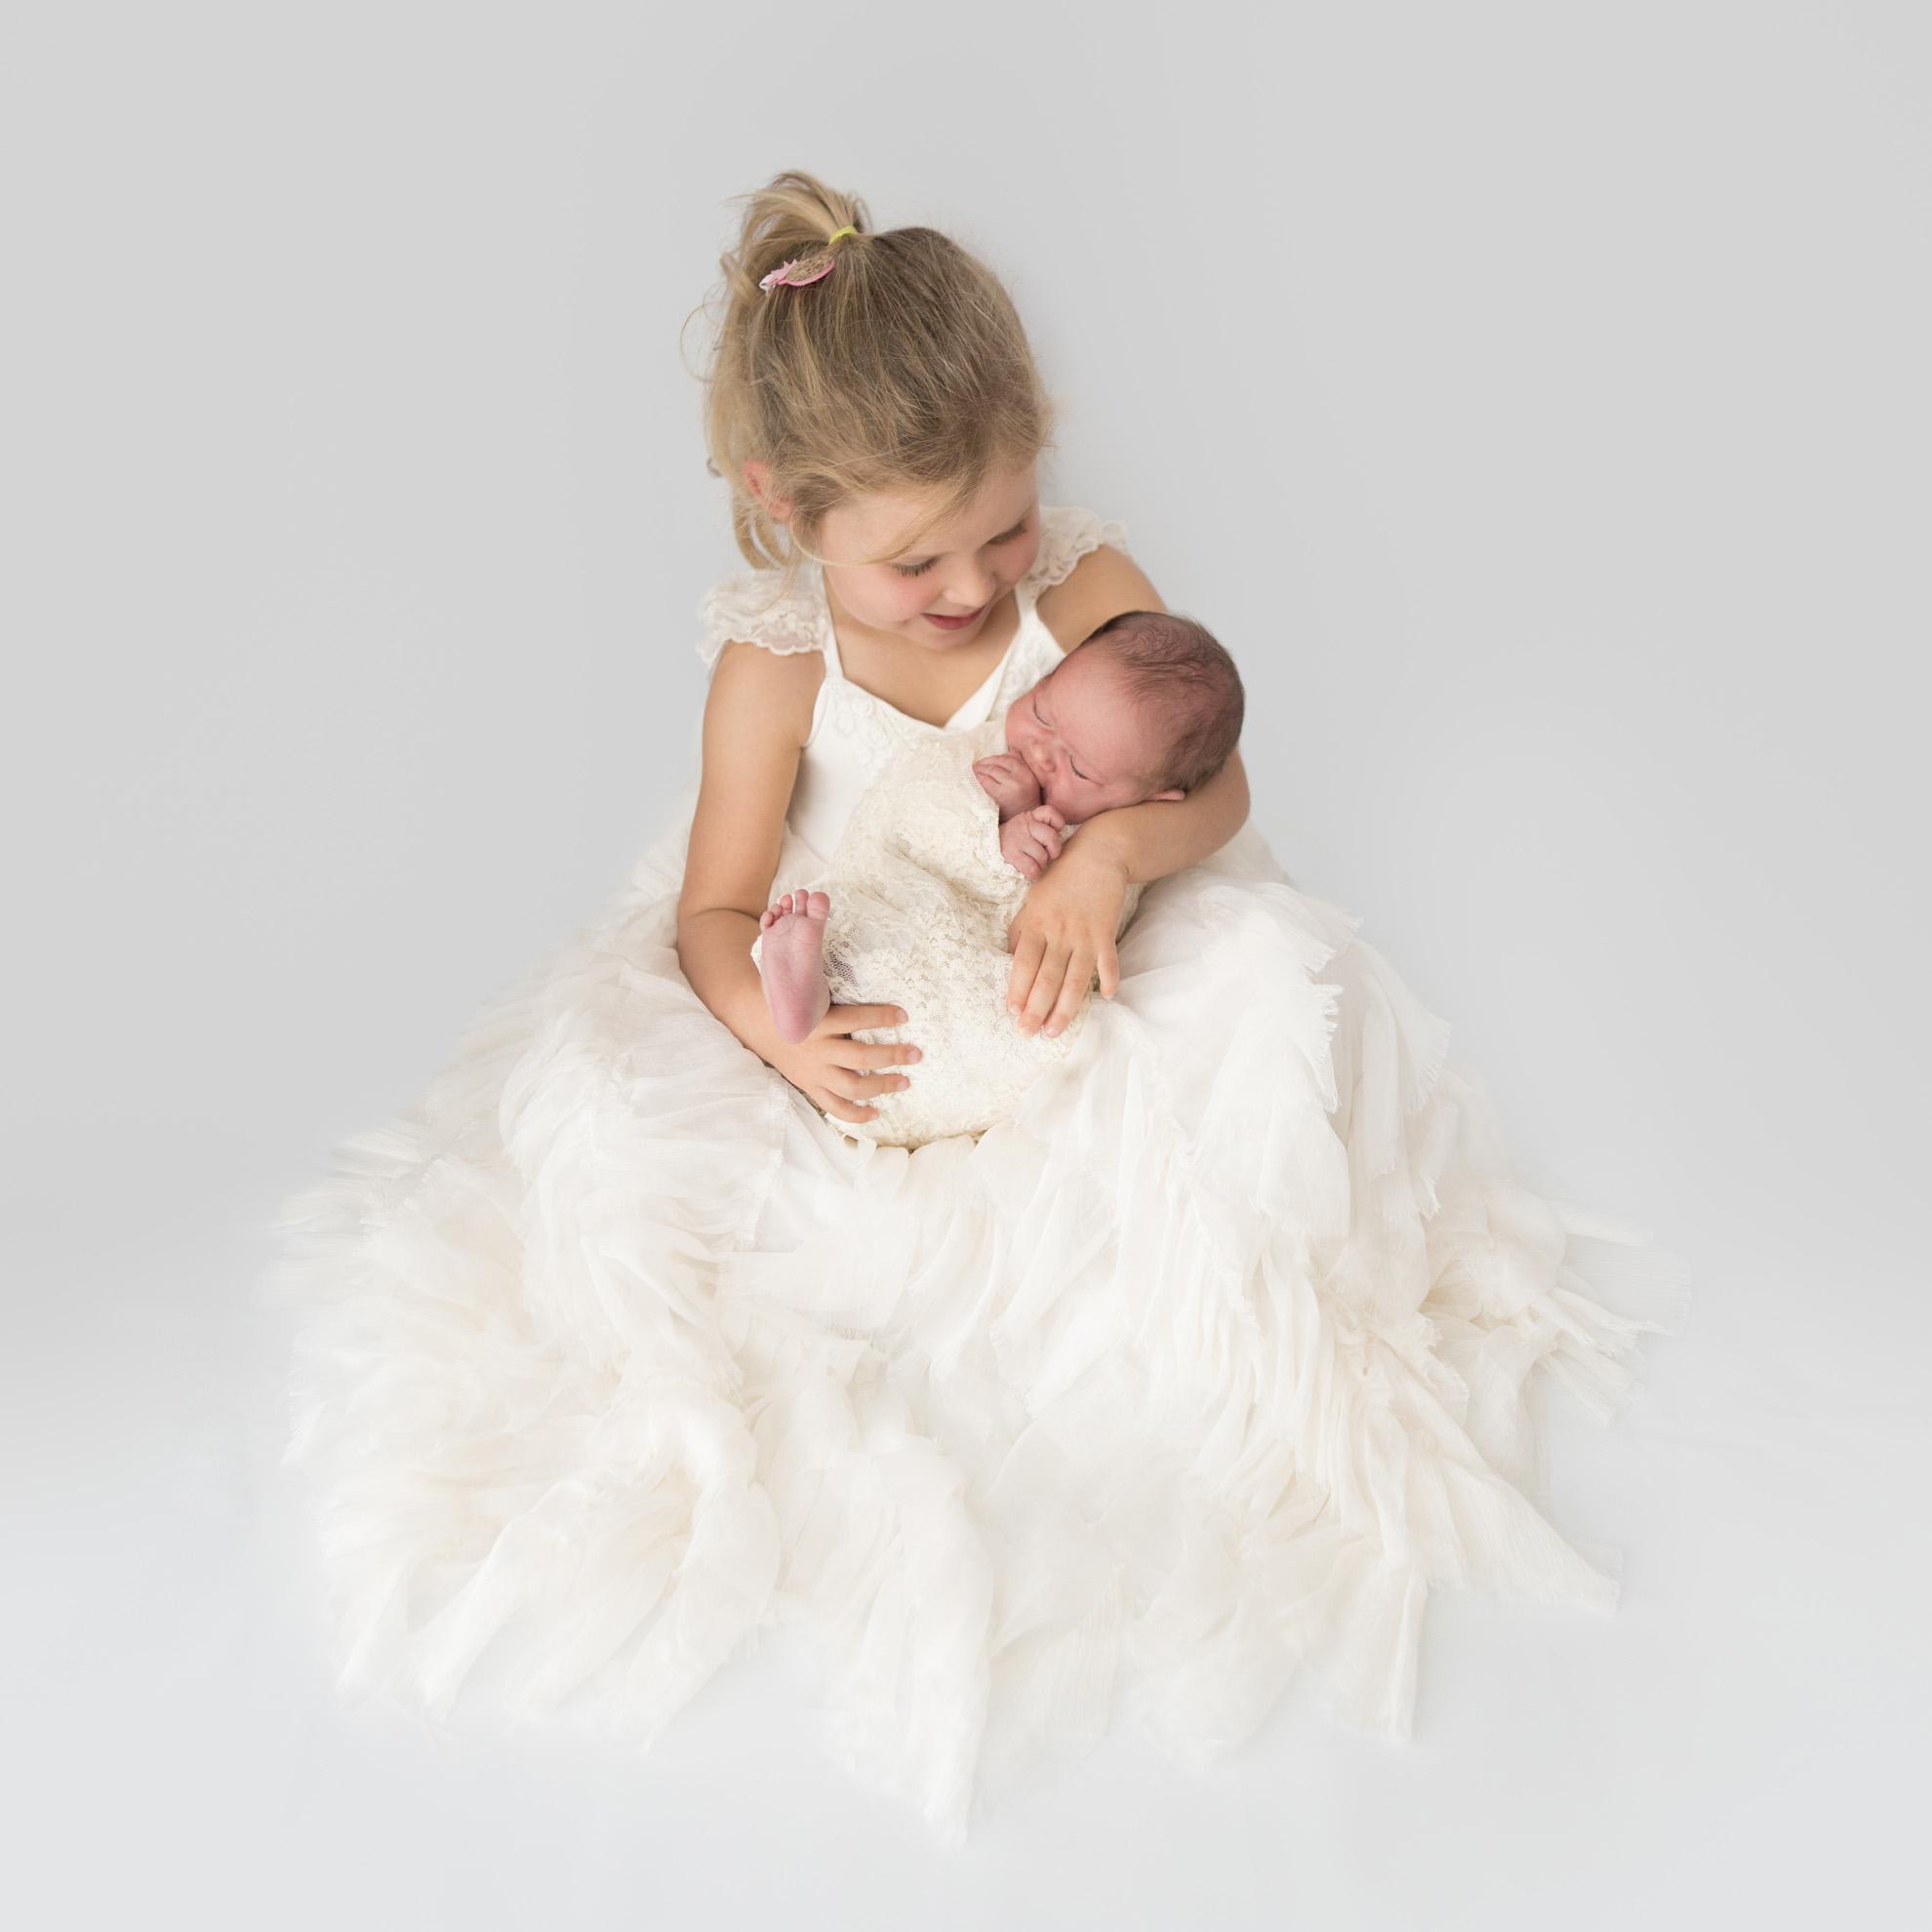 Hamilton-newborn-photographer-sisters-photo.jpg